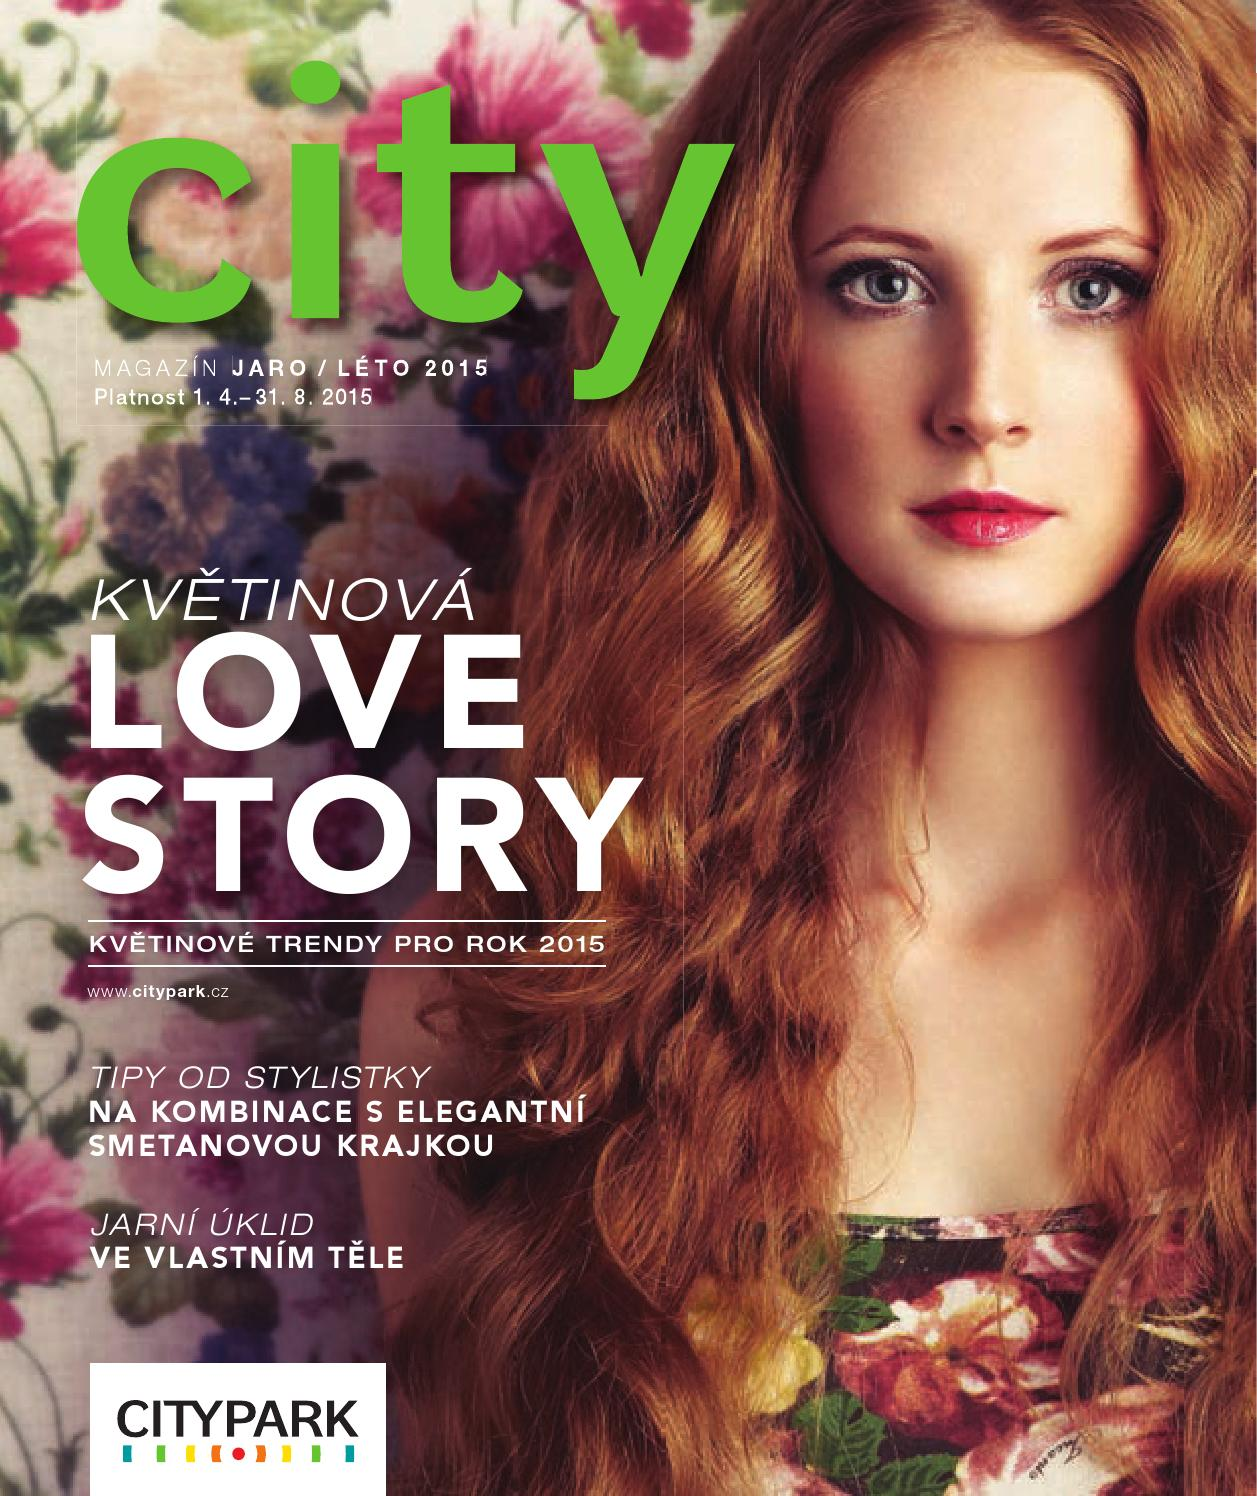 237173c27 Citypark jihlava magazin jaro leto 2015 06 (1) by Test - issuu